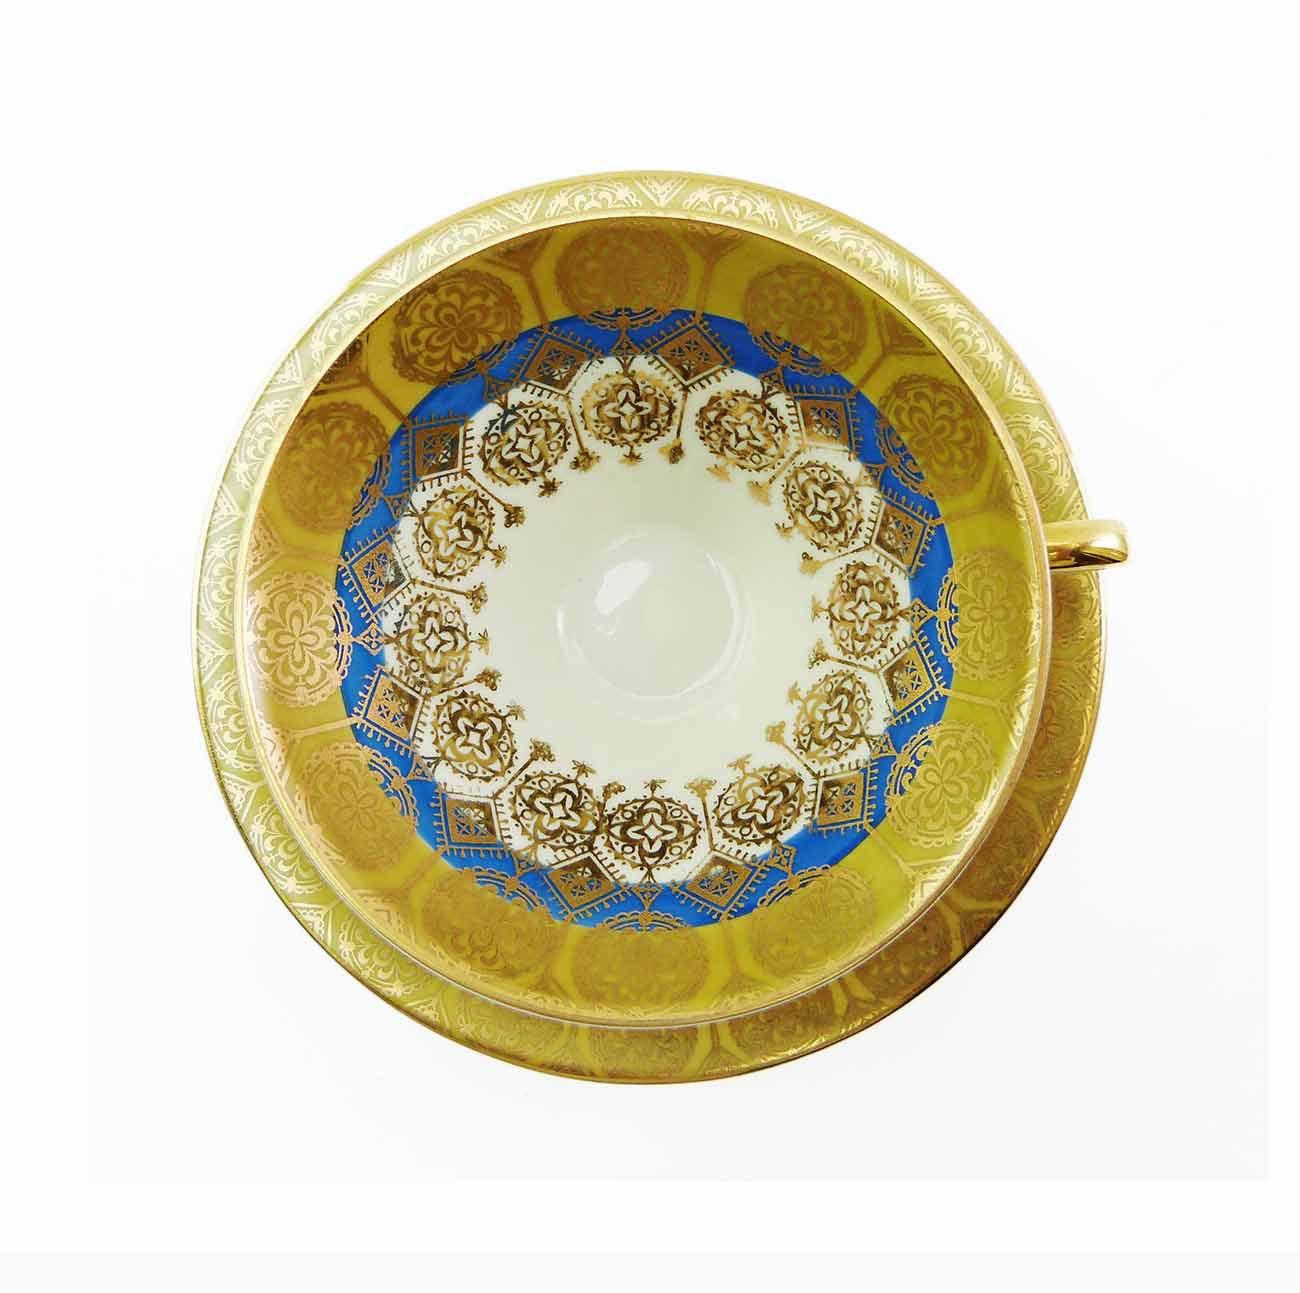 Atomic Gold Blue Tea Cup & Saucer Set Winterling Bavaria Vintage 1950s Hand Pain - $58.50